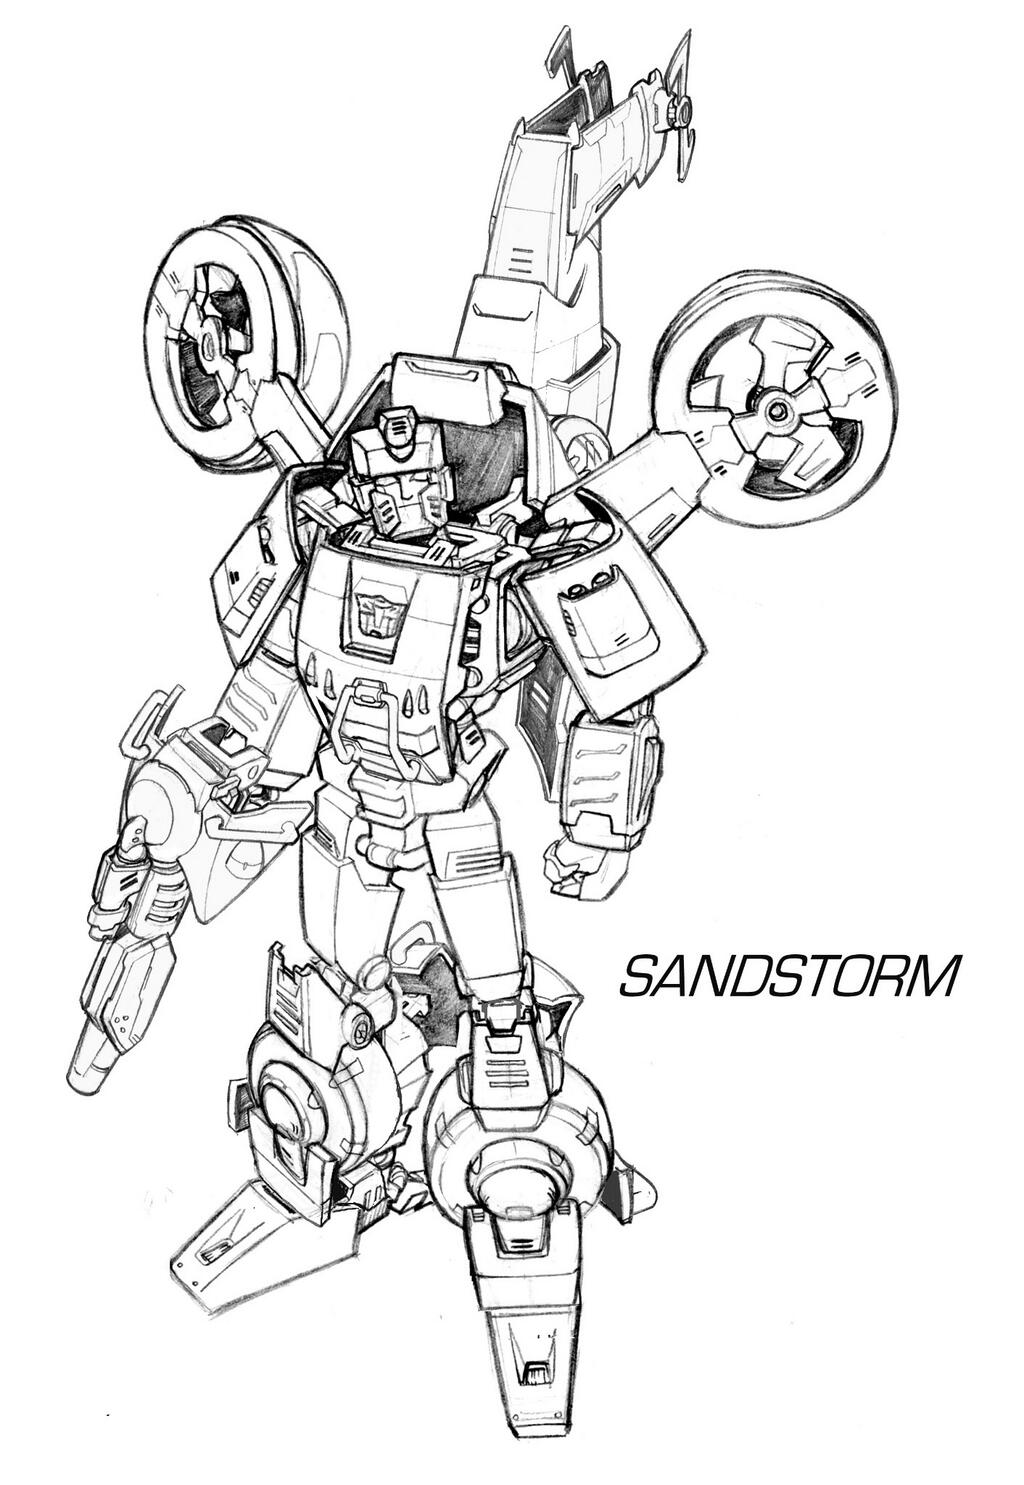 Hasbro Generations IDW Sandstorm Nick Roche Concept Art